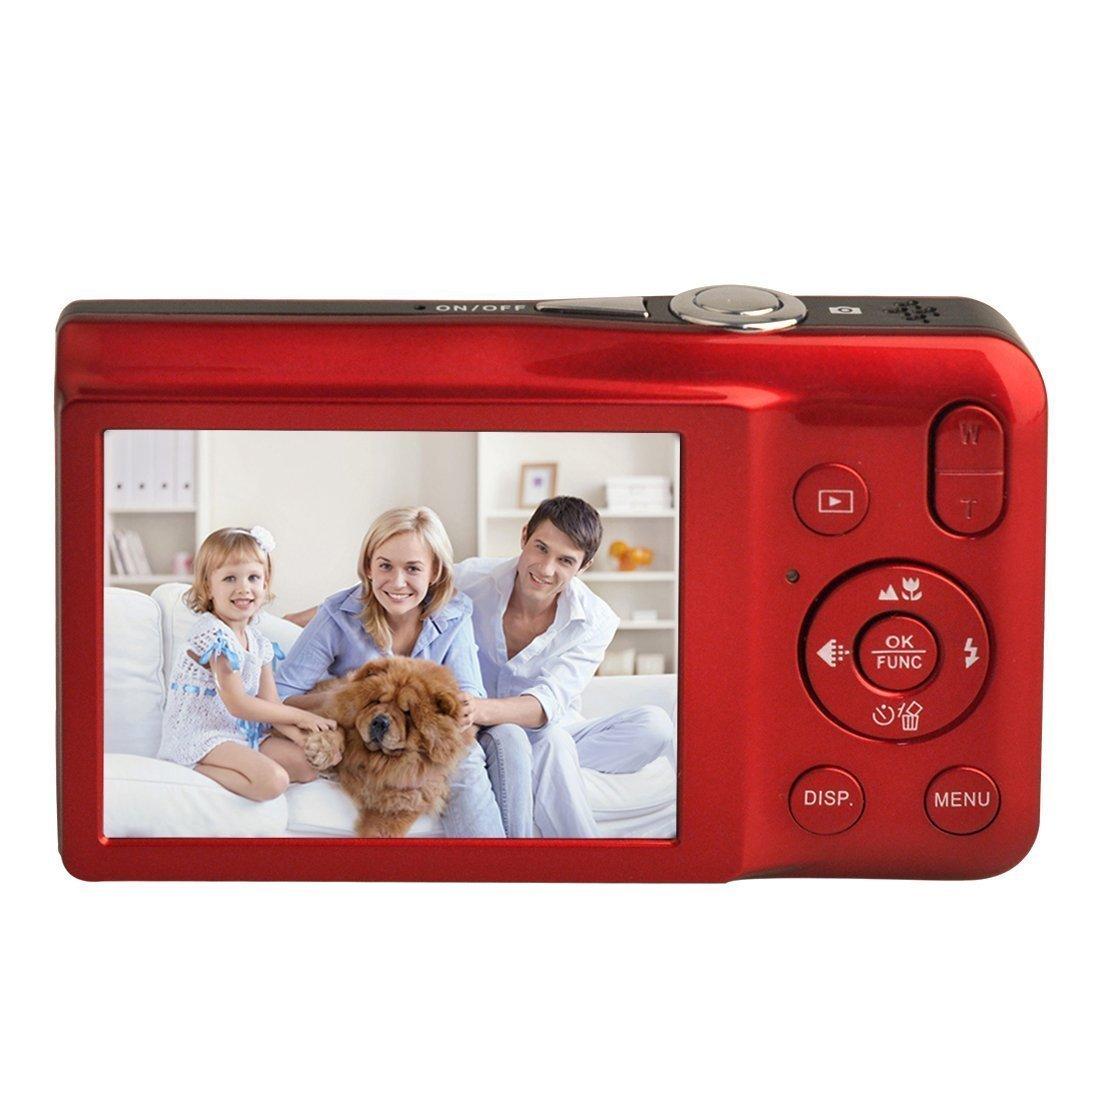 Cámara Digital Stoga DV-V100 Mini DV 5X Zoom óptico 2,7 pulgadasTFT LCD HD Digital Cámara compacta-Rojo